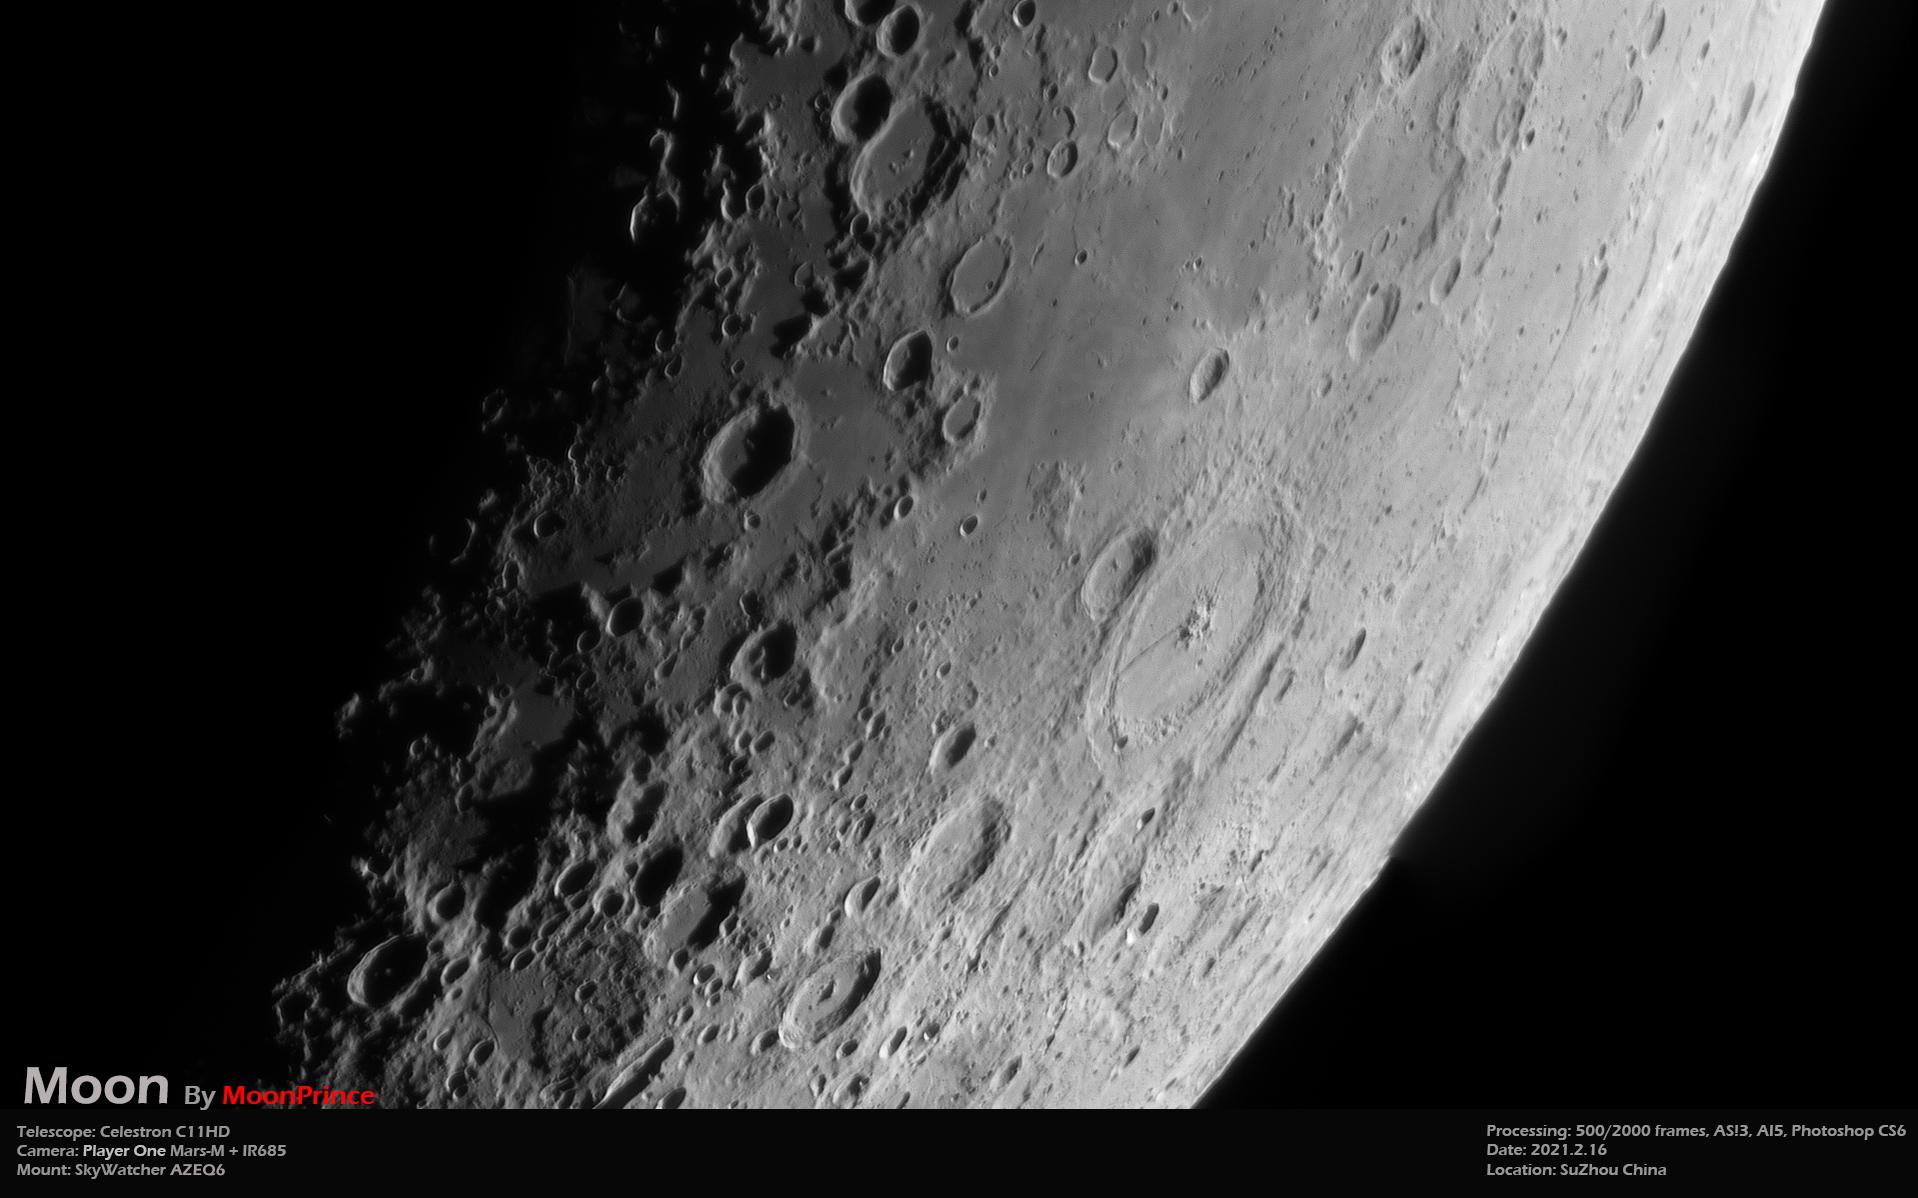 Moon20210216-S6.jpg